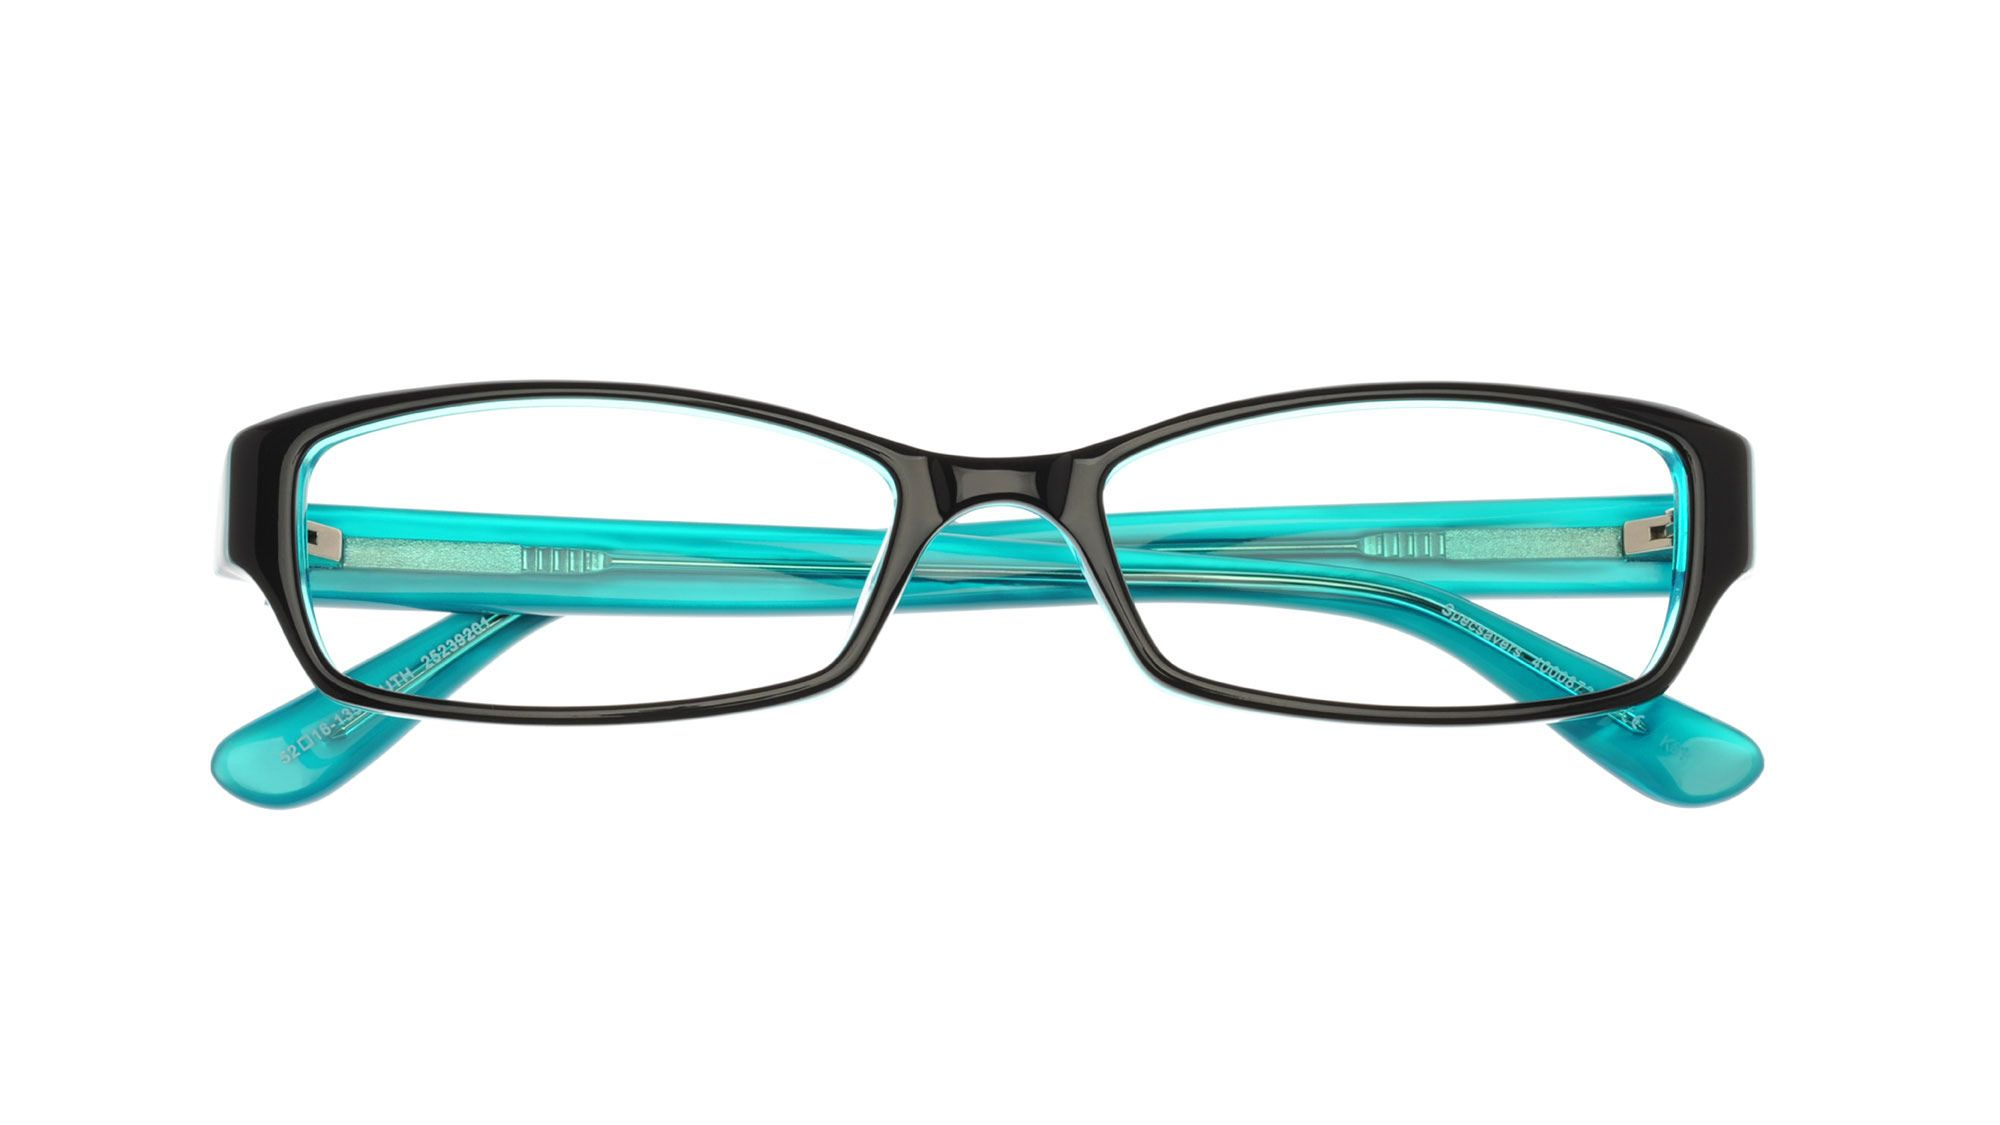 4264219238b Specsavers glasses - RUTH Womens Glasses